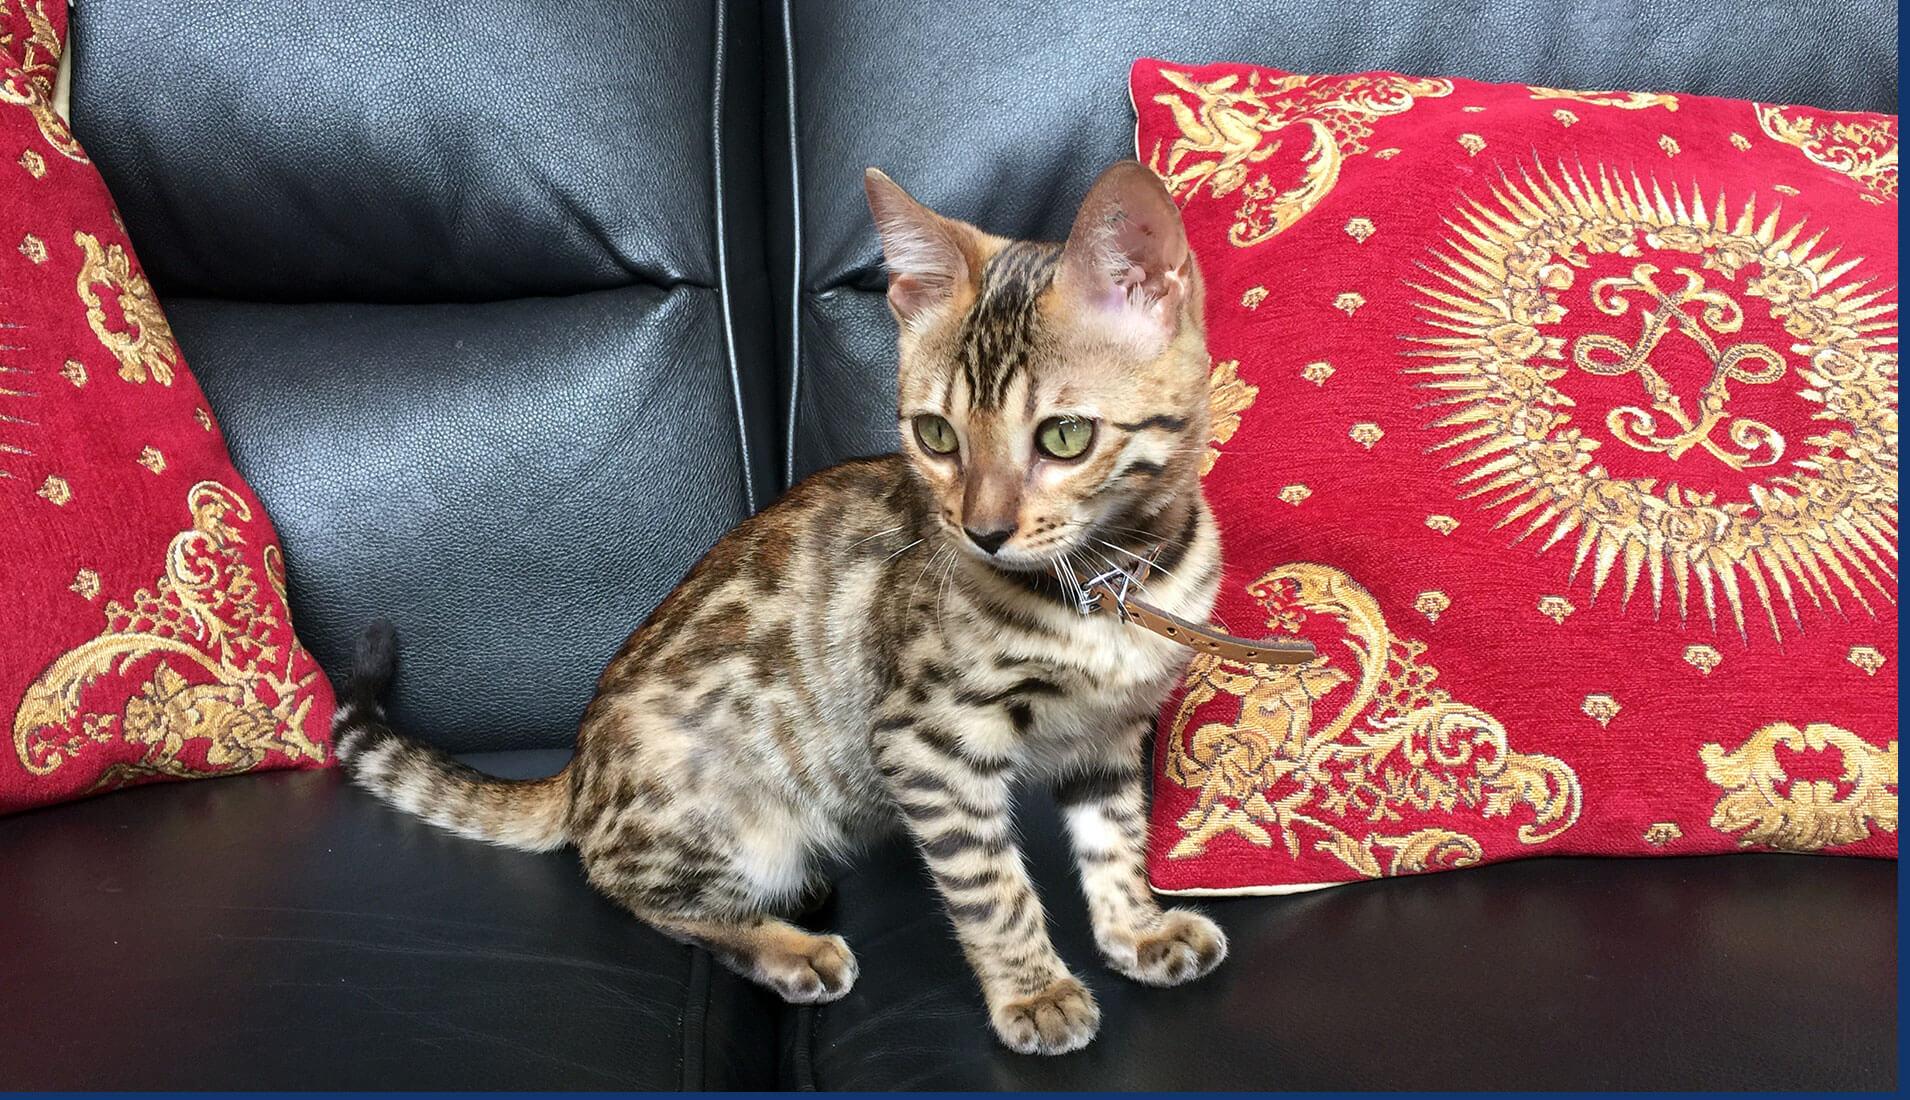 jabring-bengal-cats-australia-kittens